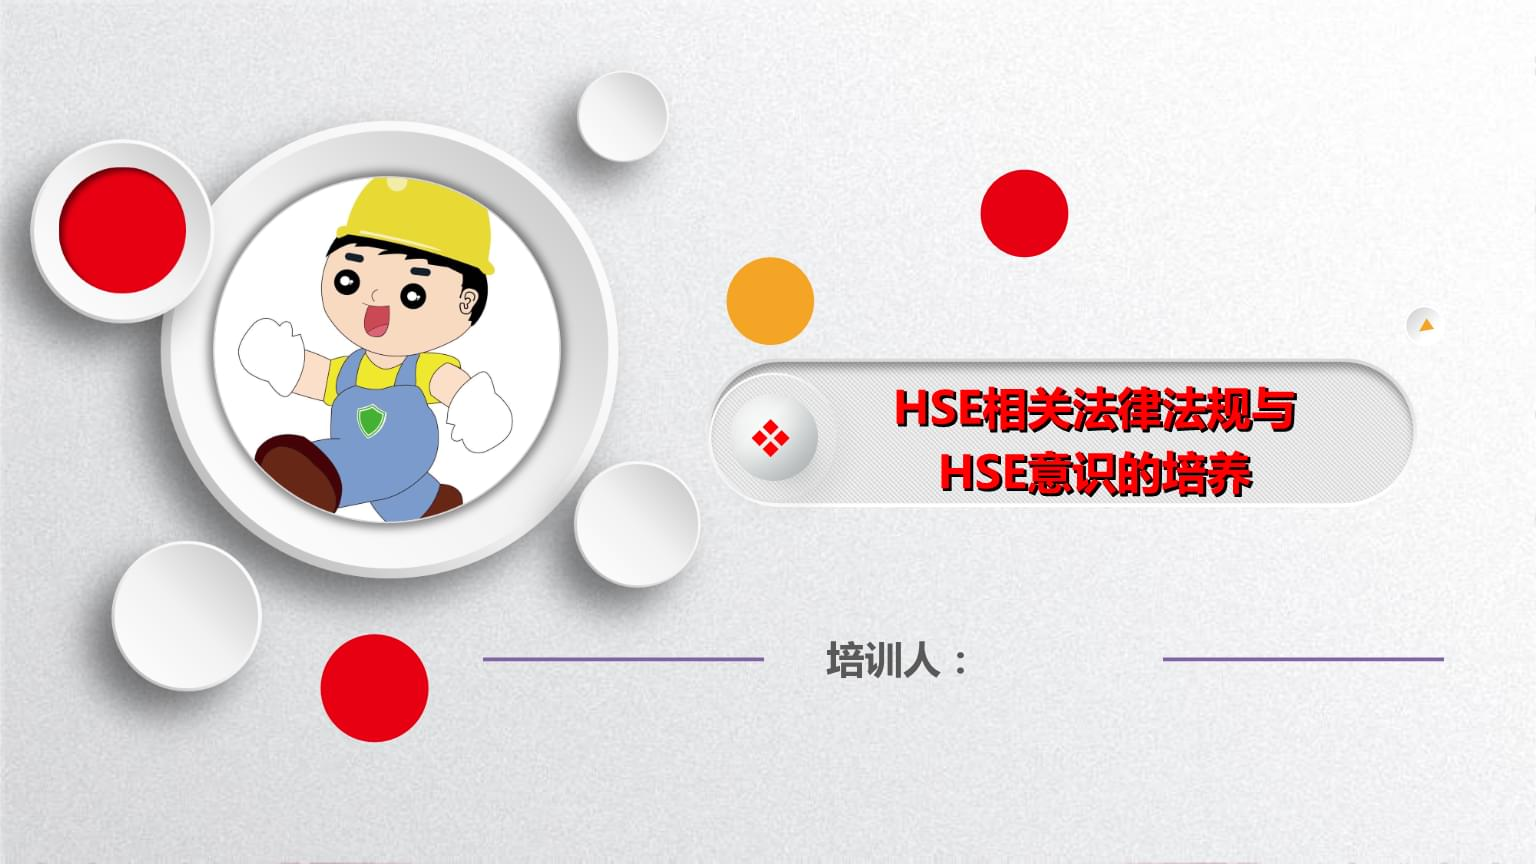 HSE法律法规与HSE意识培训课件.ppt